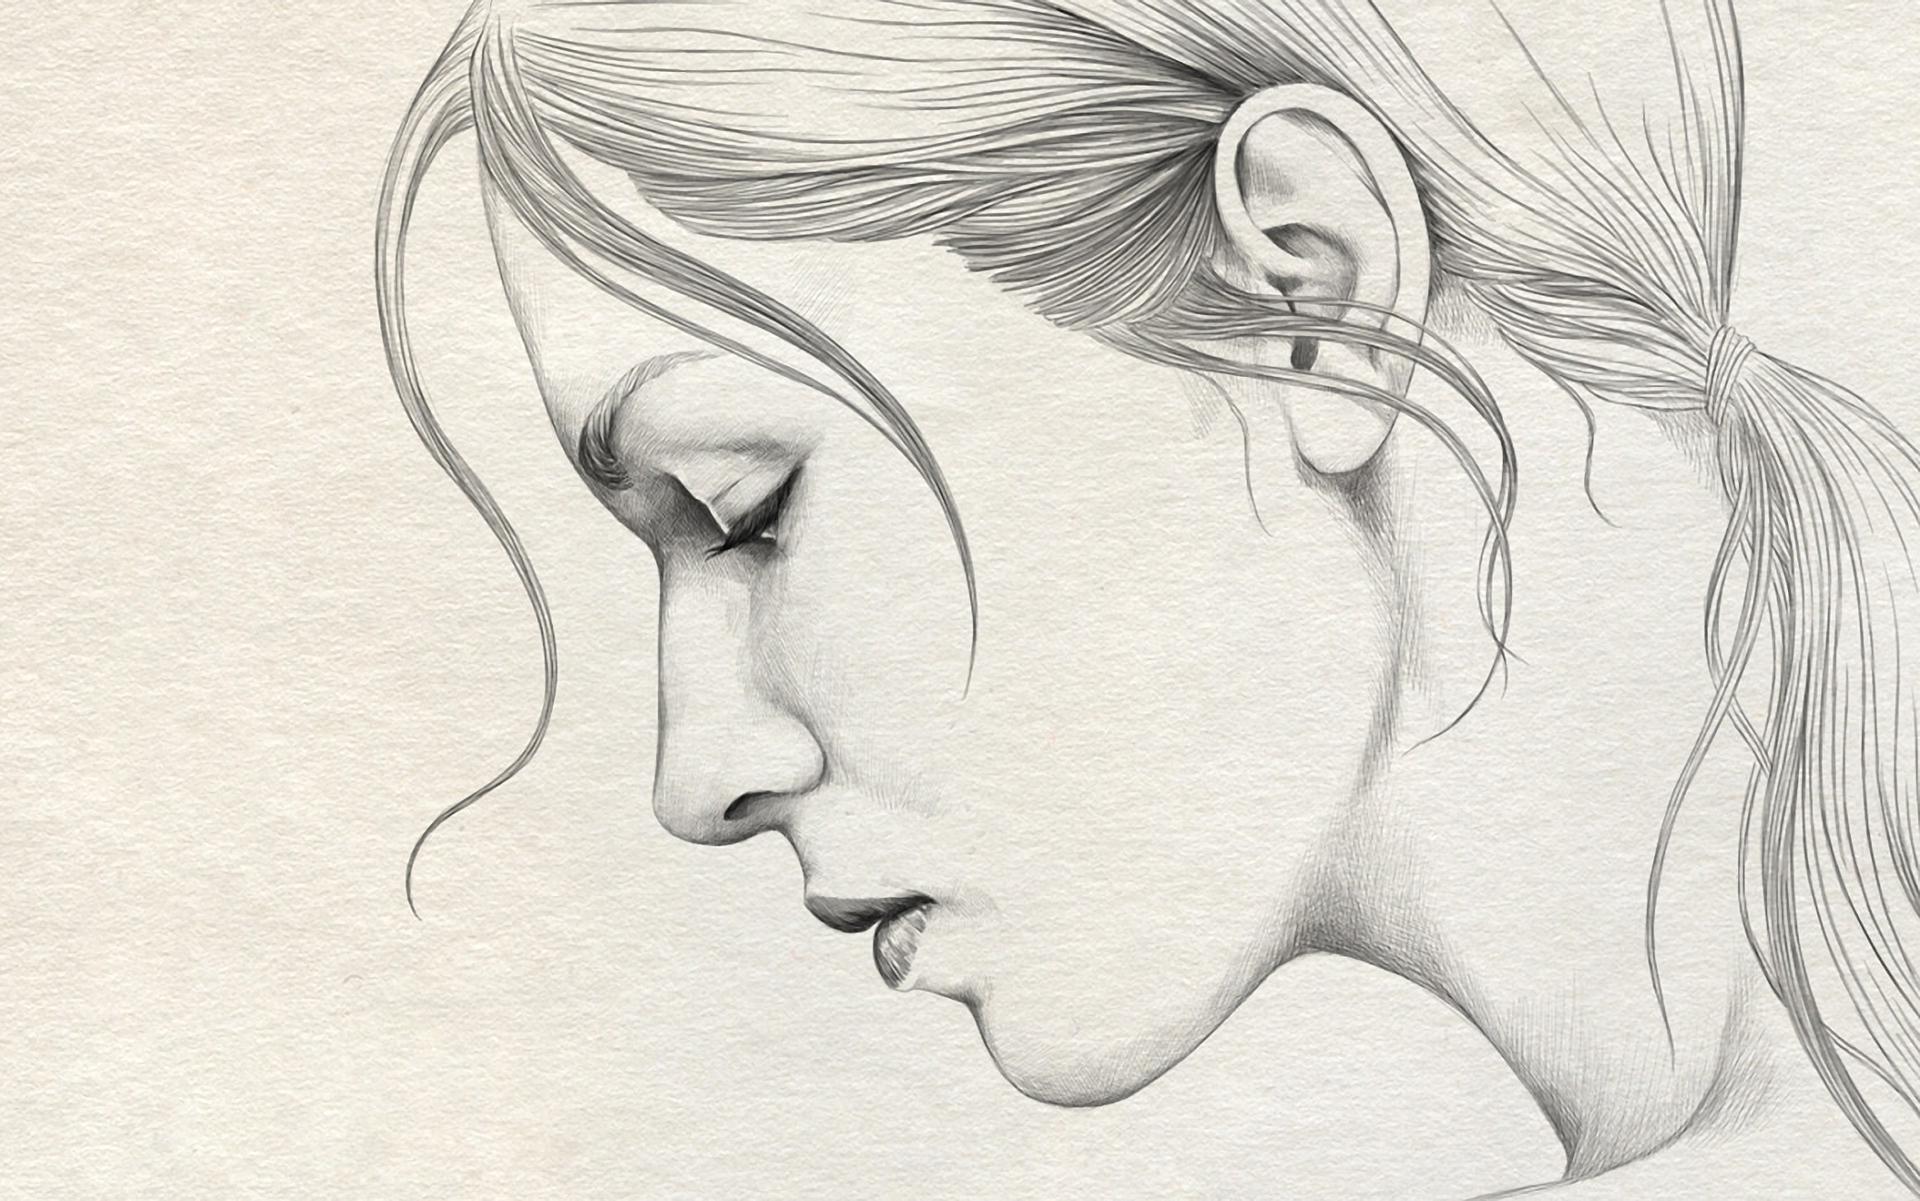 1920x1201 Simple Pencil Sketches Of Girls Simple Pencil Drawings Of Ladies